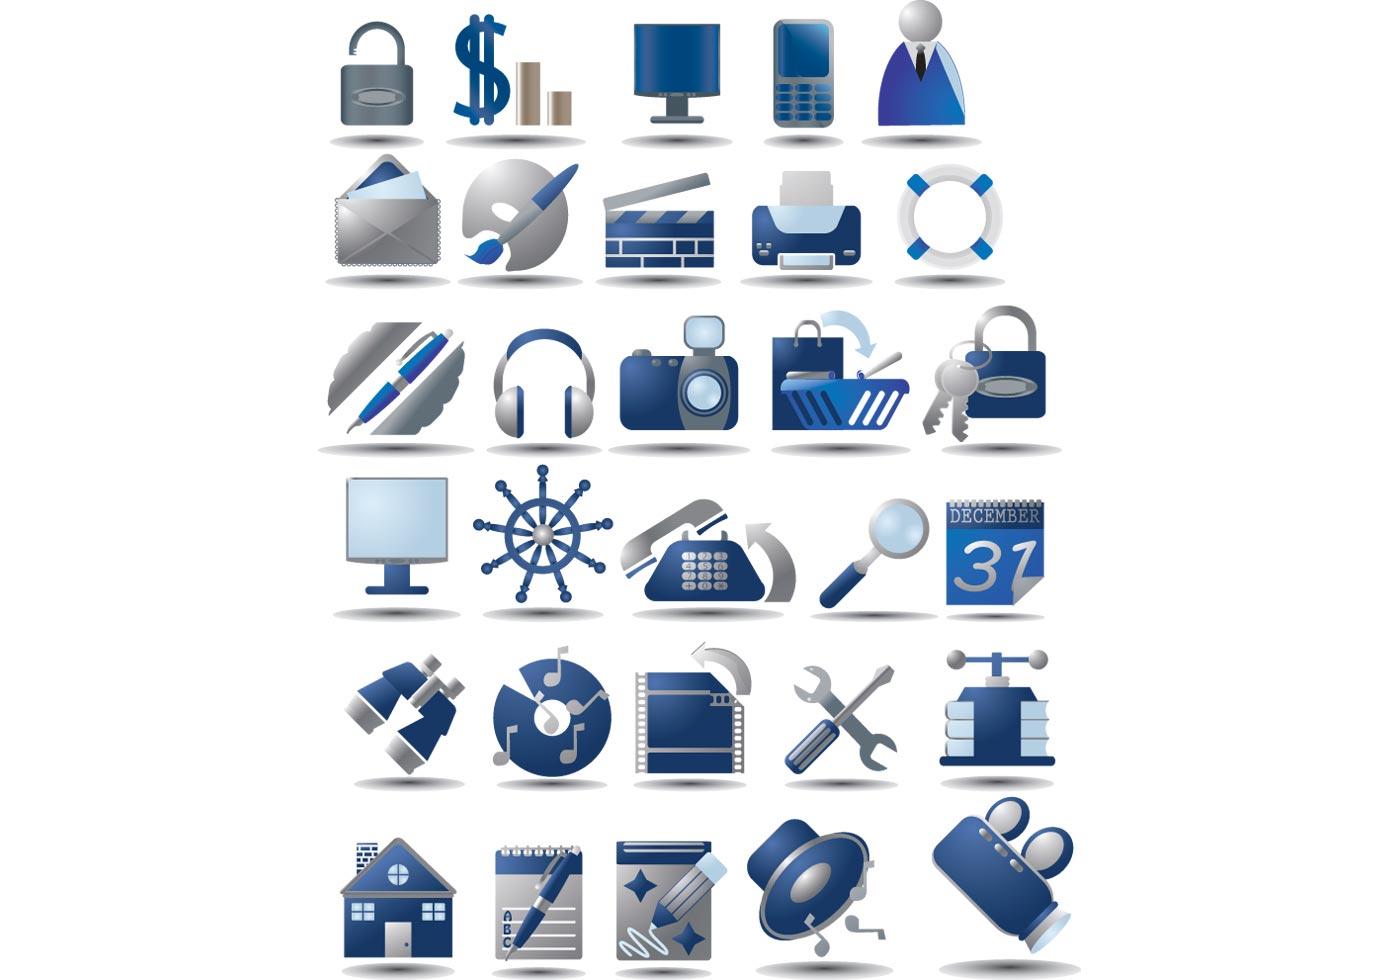 Скачать Eco Technology Flat Icons: Download Free Vector Art, Stock